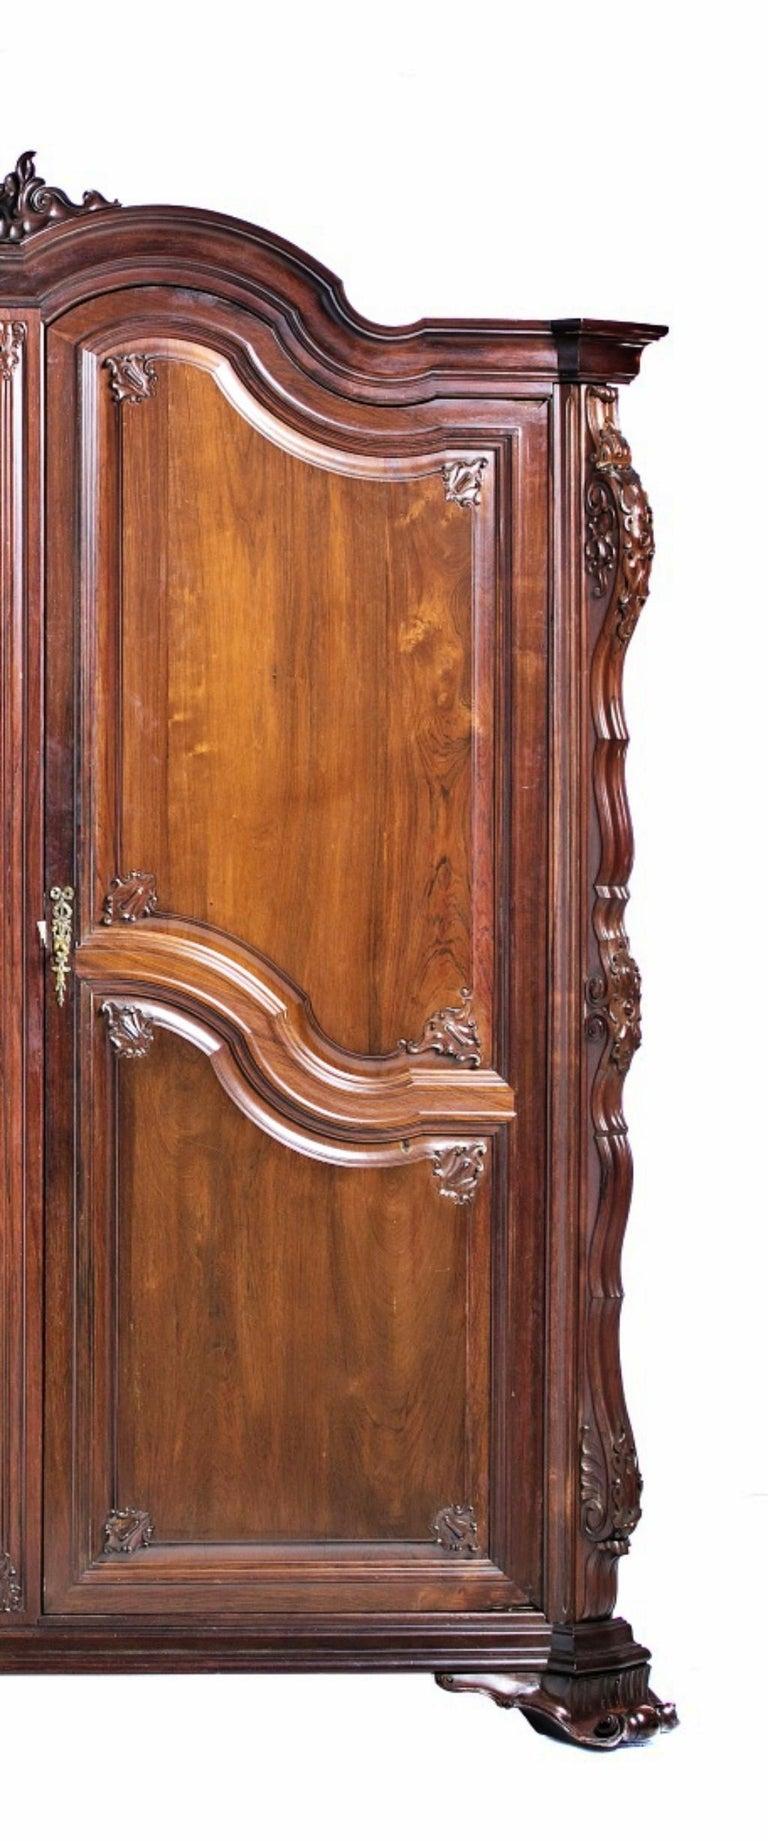 Portuguese Important Brazilian Wardrobe Closet in Palisander Wood, 20th Century For Sale